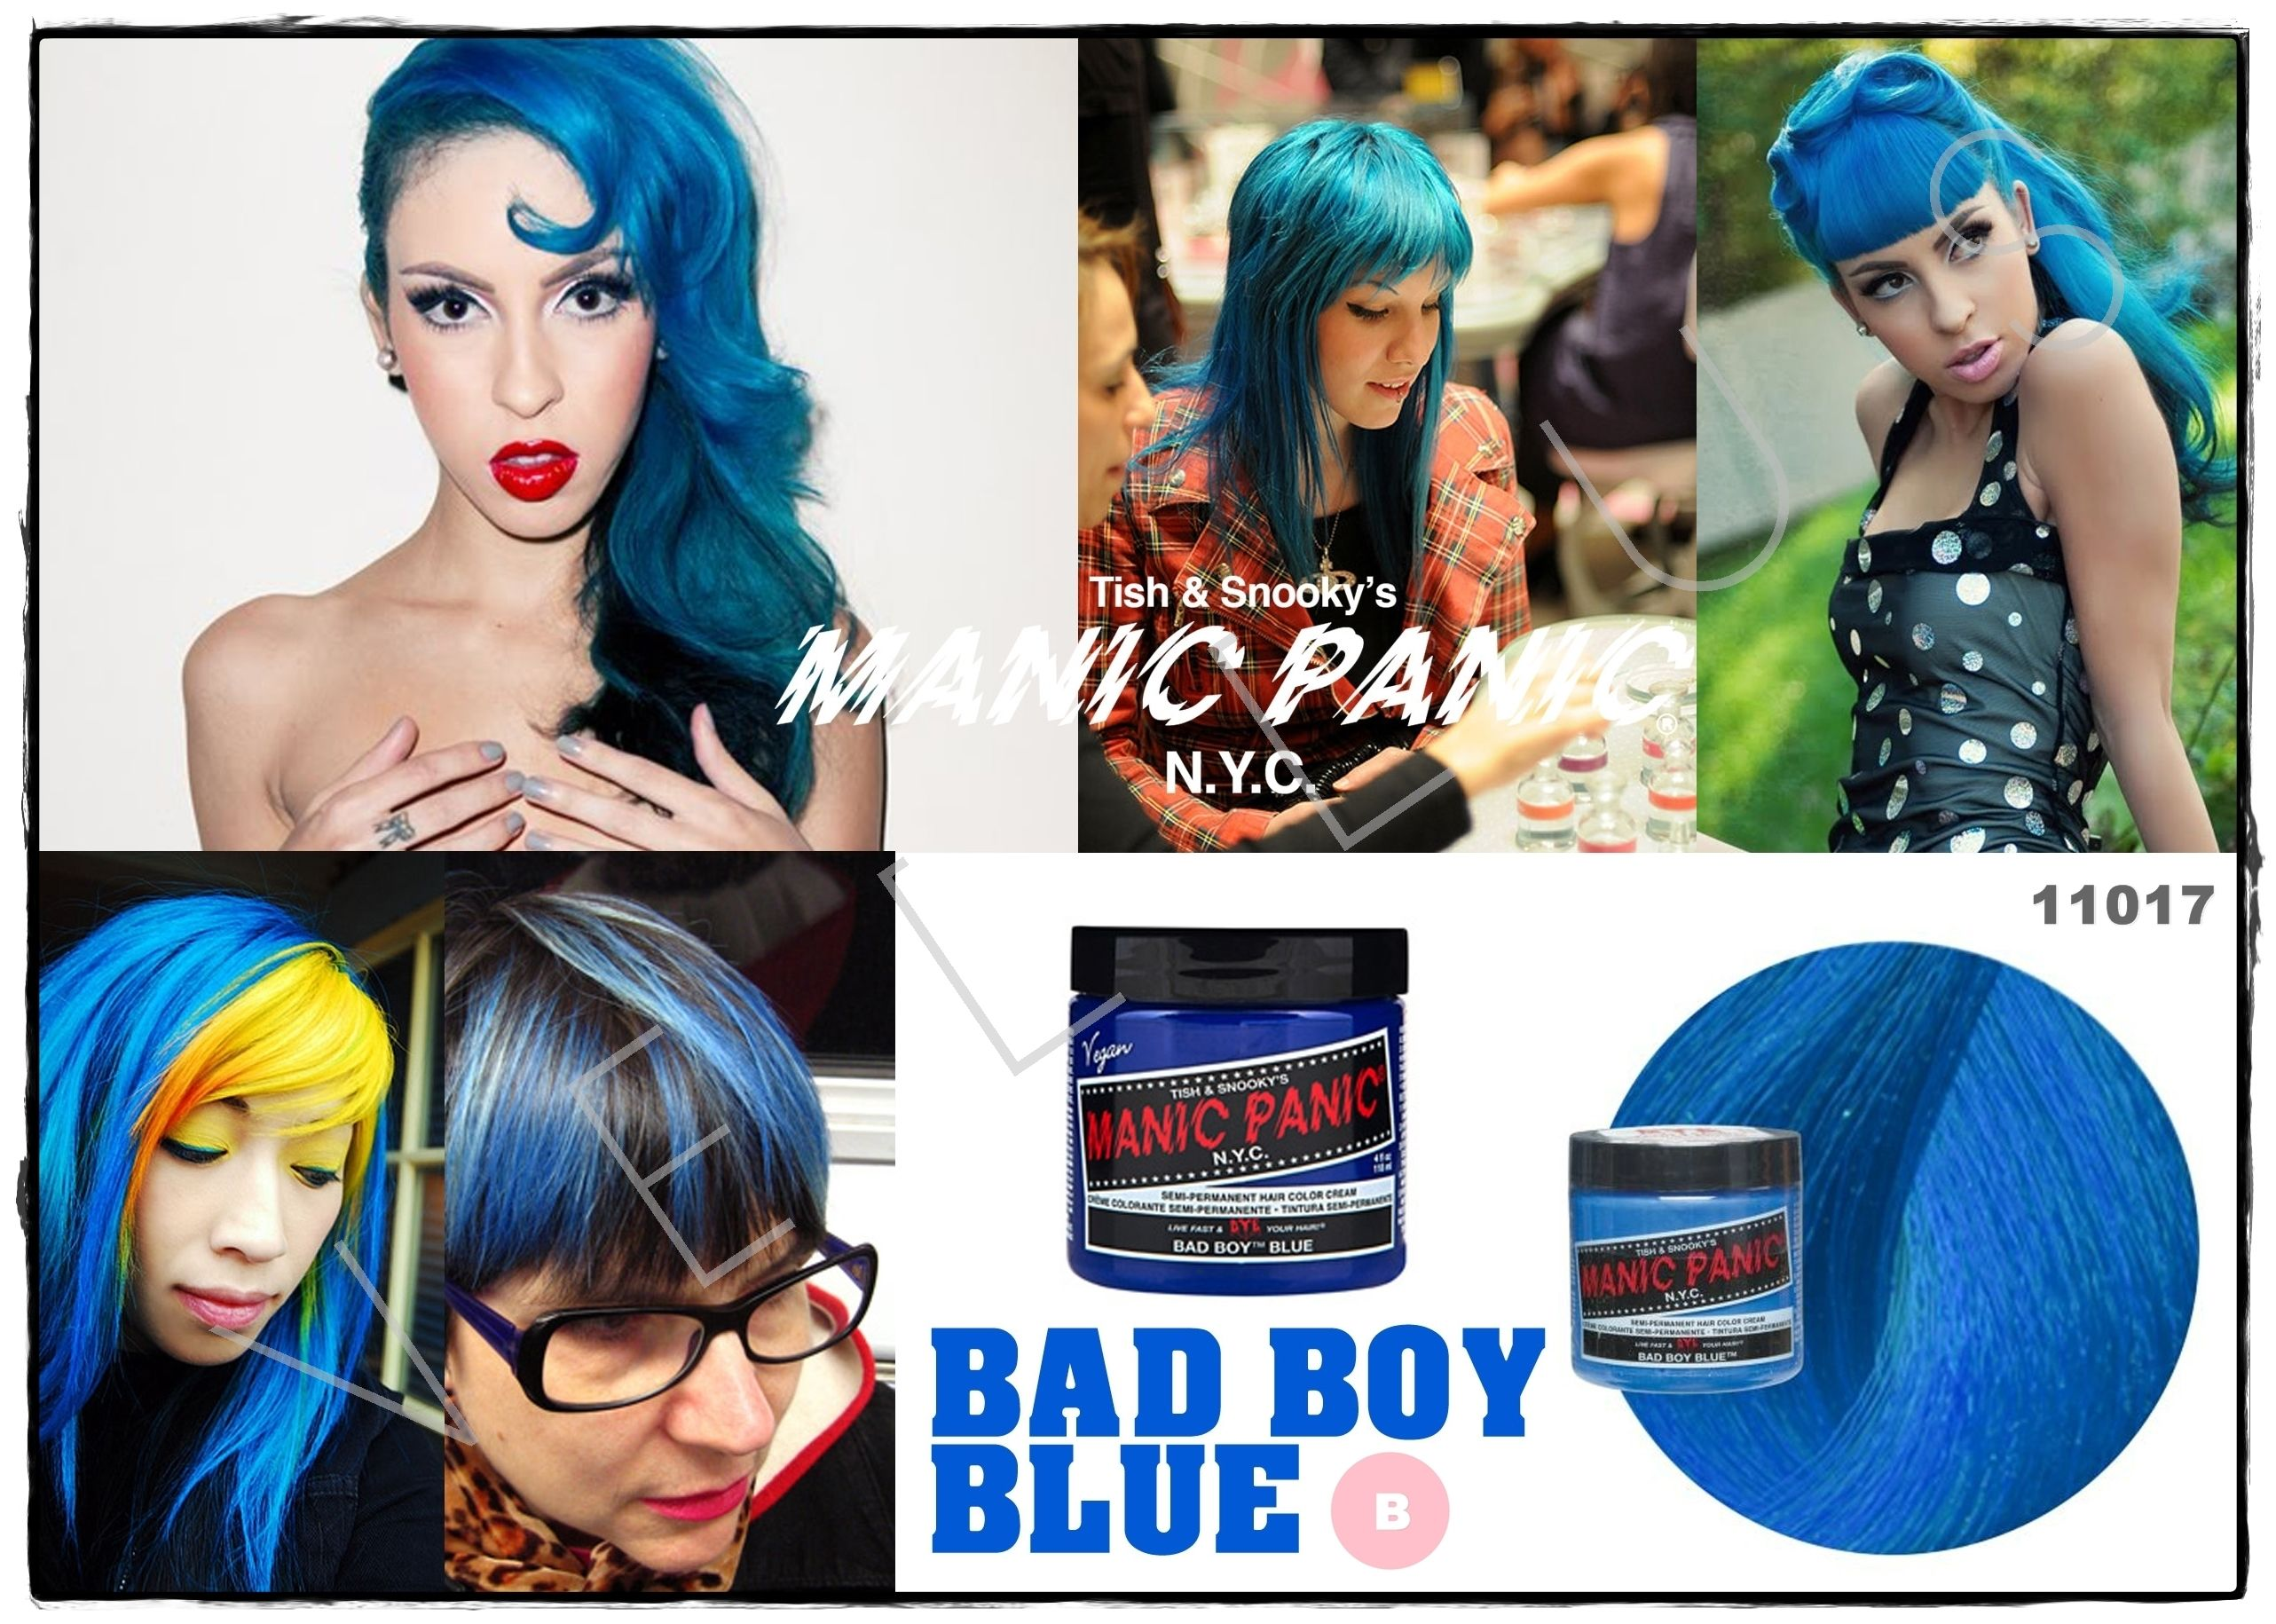 Manic Panic Classic Bad Boy Blue Vellus Hair Studio 83a Tanjong Pagar Road S 088504 Tel 62246566 Cabello Colores